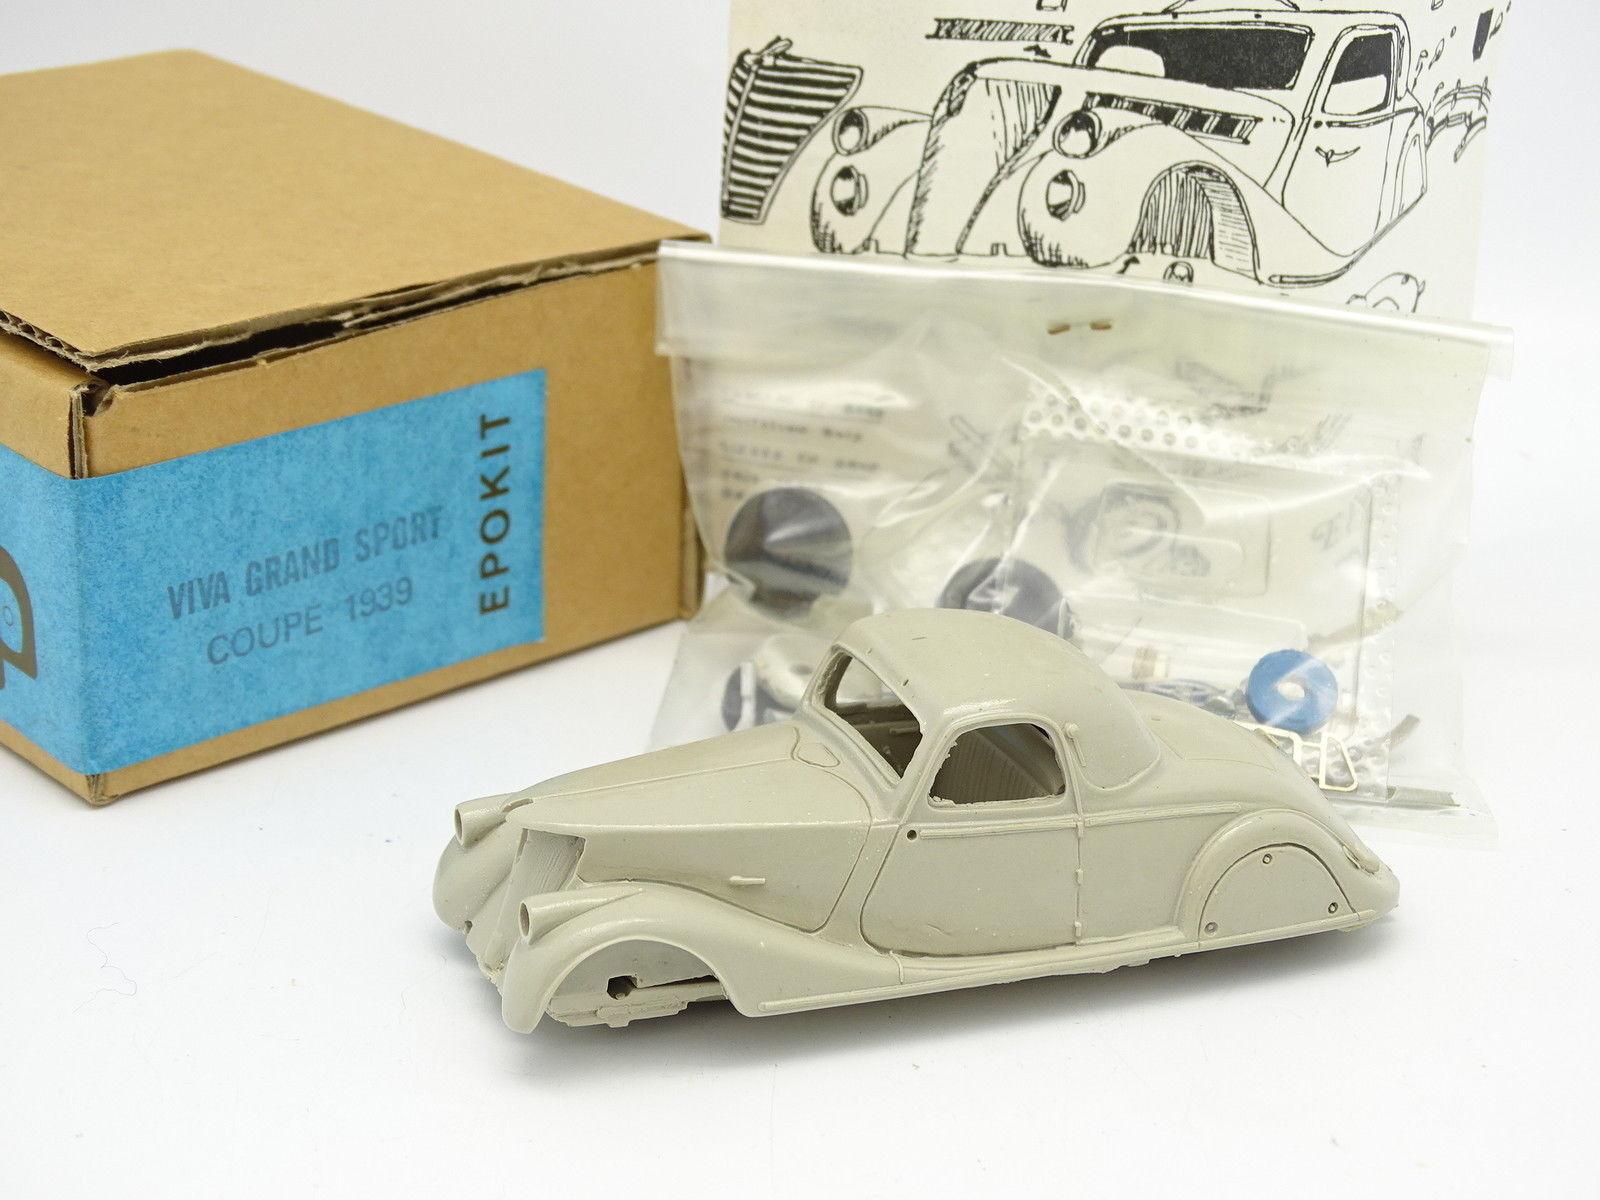 Epokit Kit à Monter 1 43 - Renault Viva Grand Sport 1939